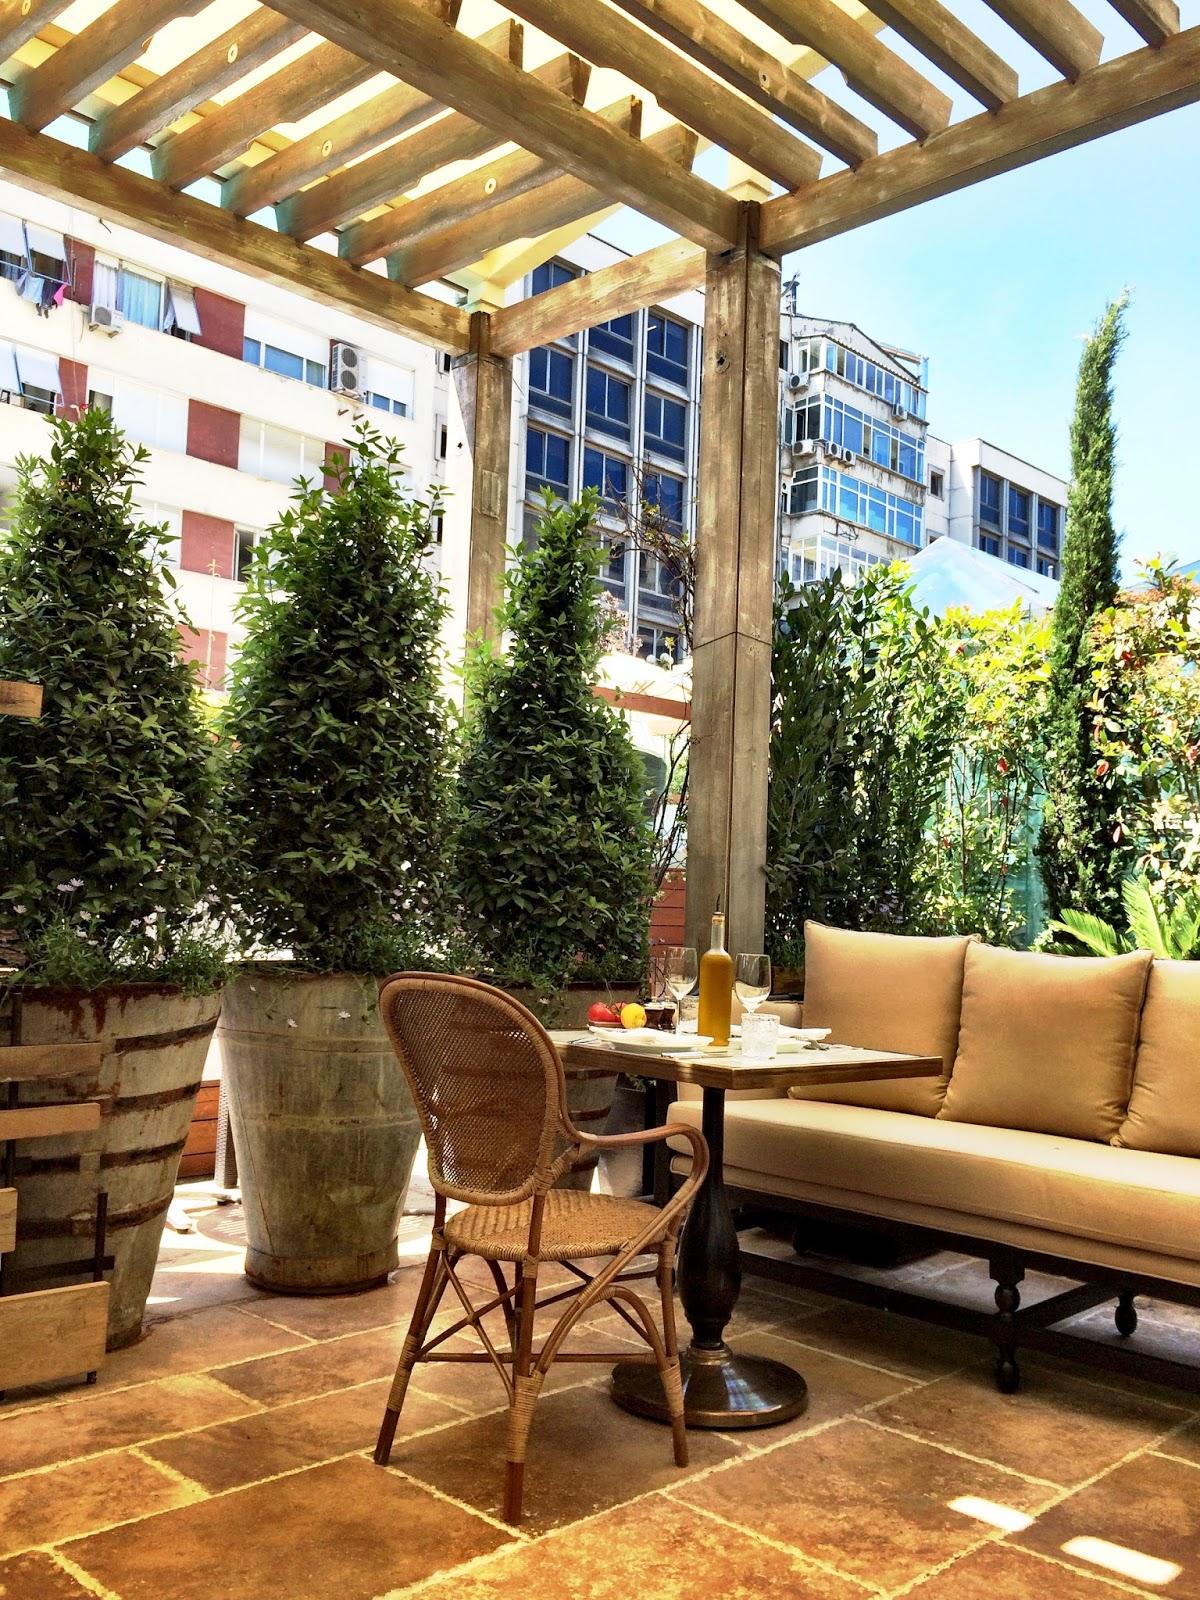 La petite maison opened in nisantasi neighborhood of for Cafe le jardin bell lane london